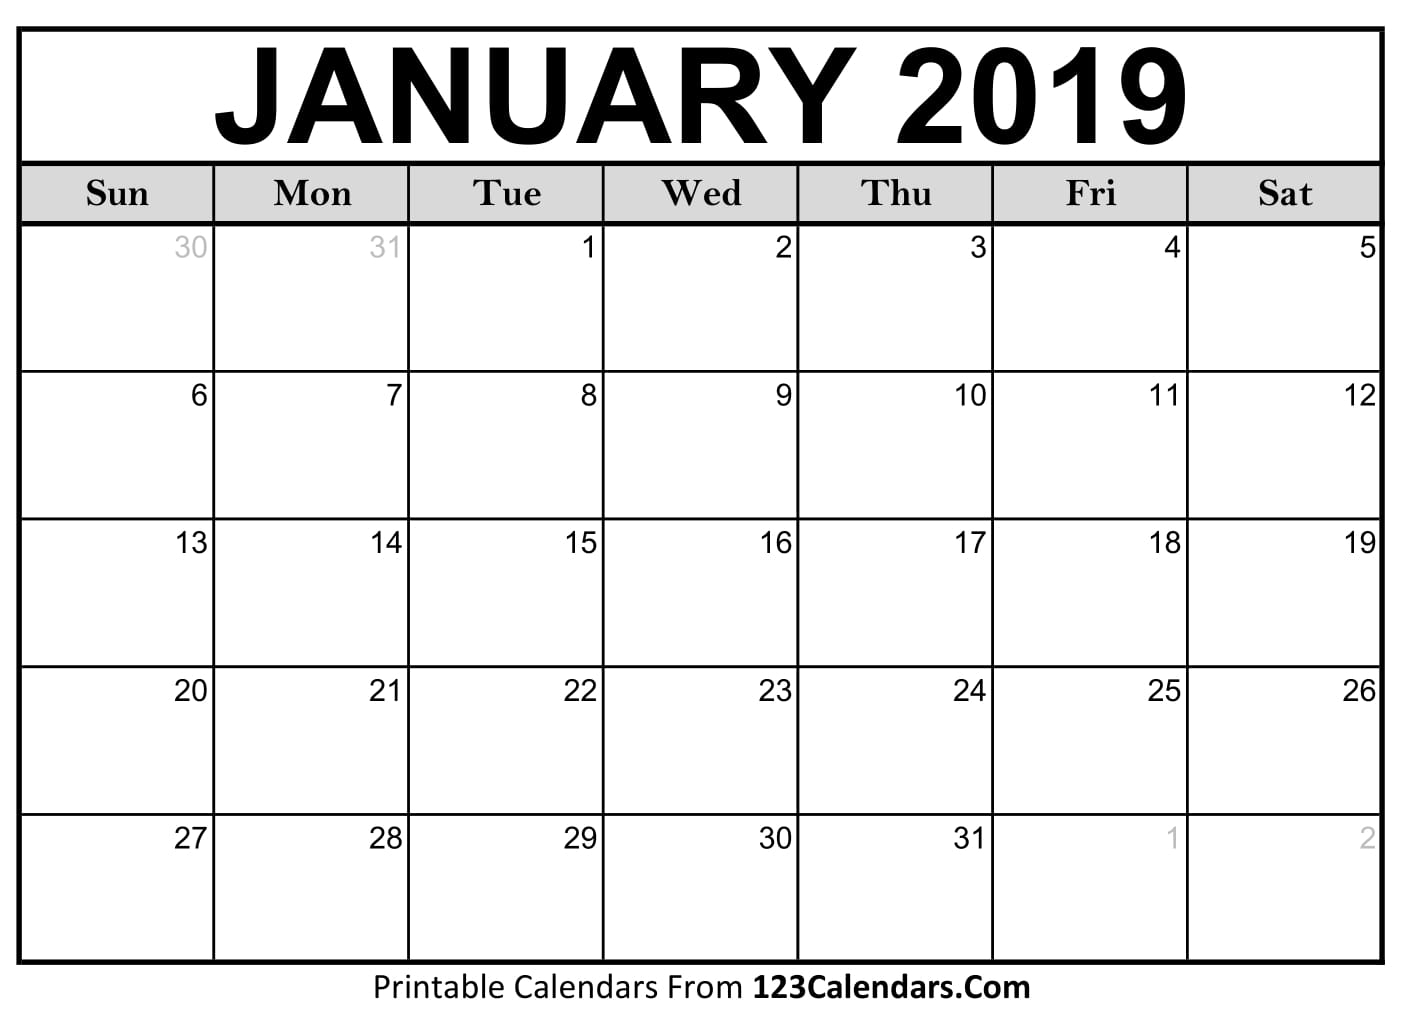 Free Printable Calendar | 123Calendars with regard to Print Off A Blank Calendar For